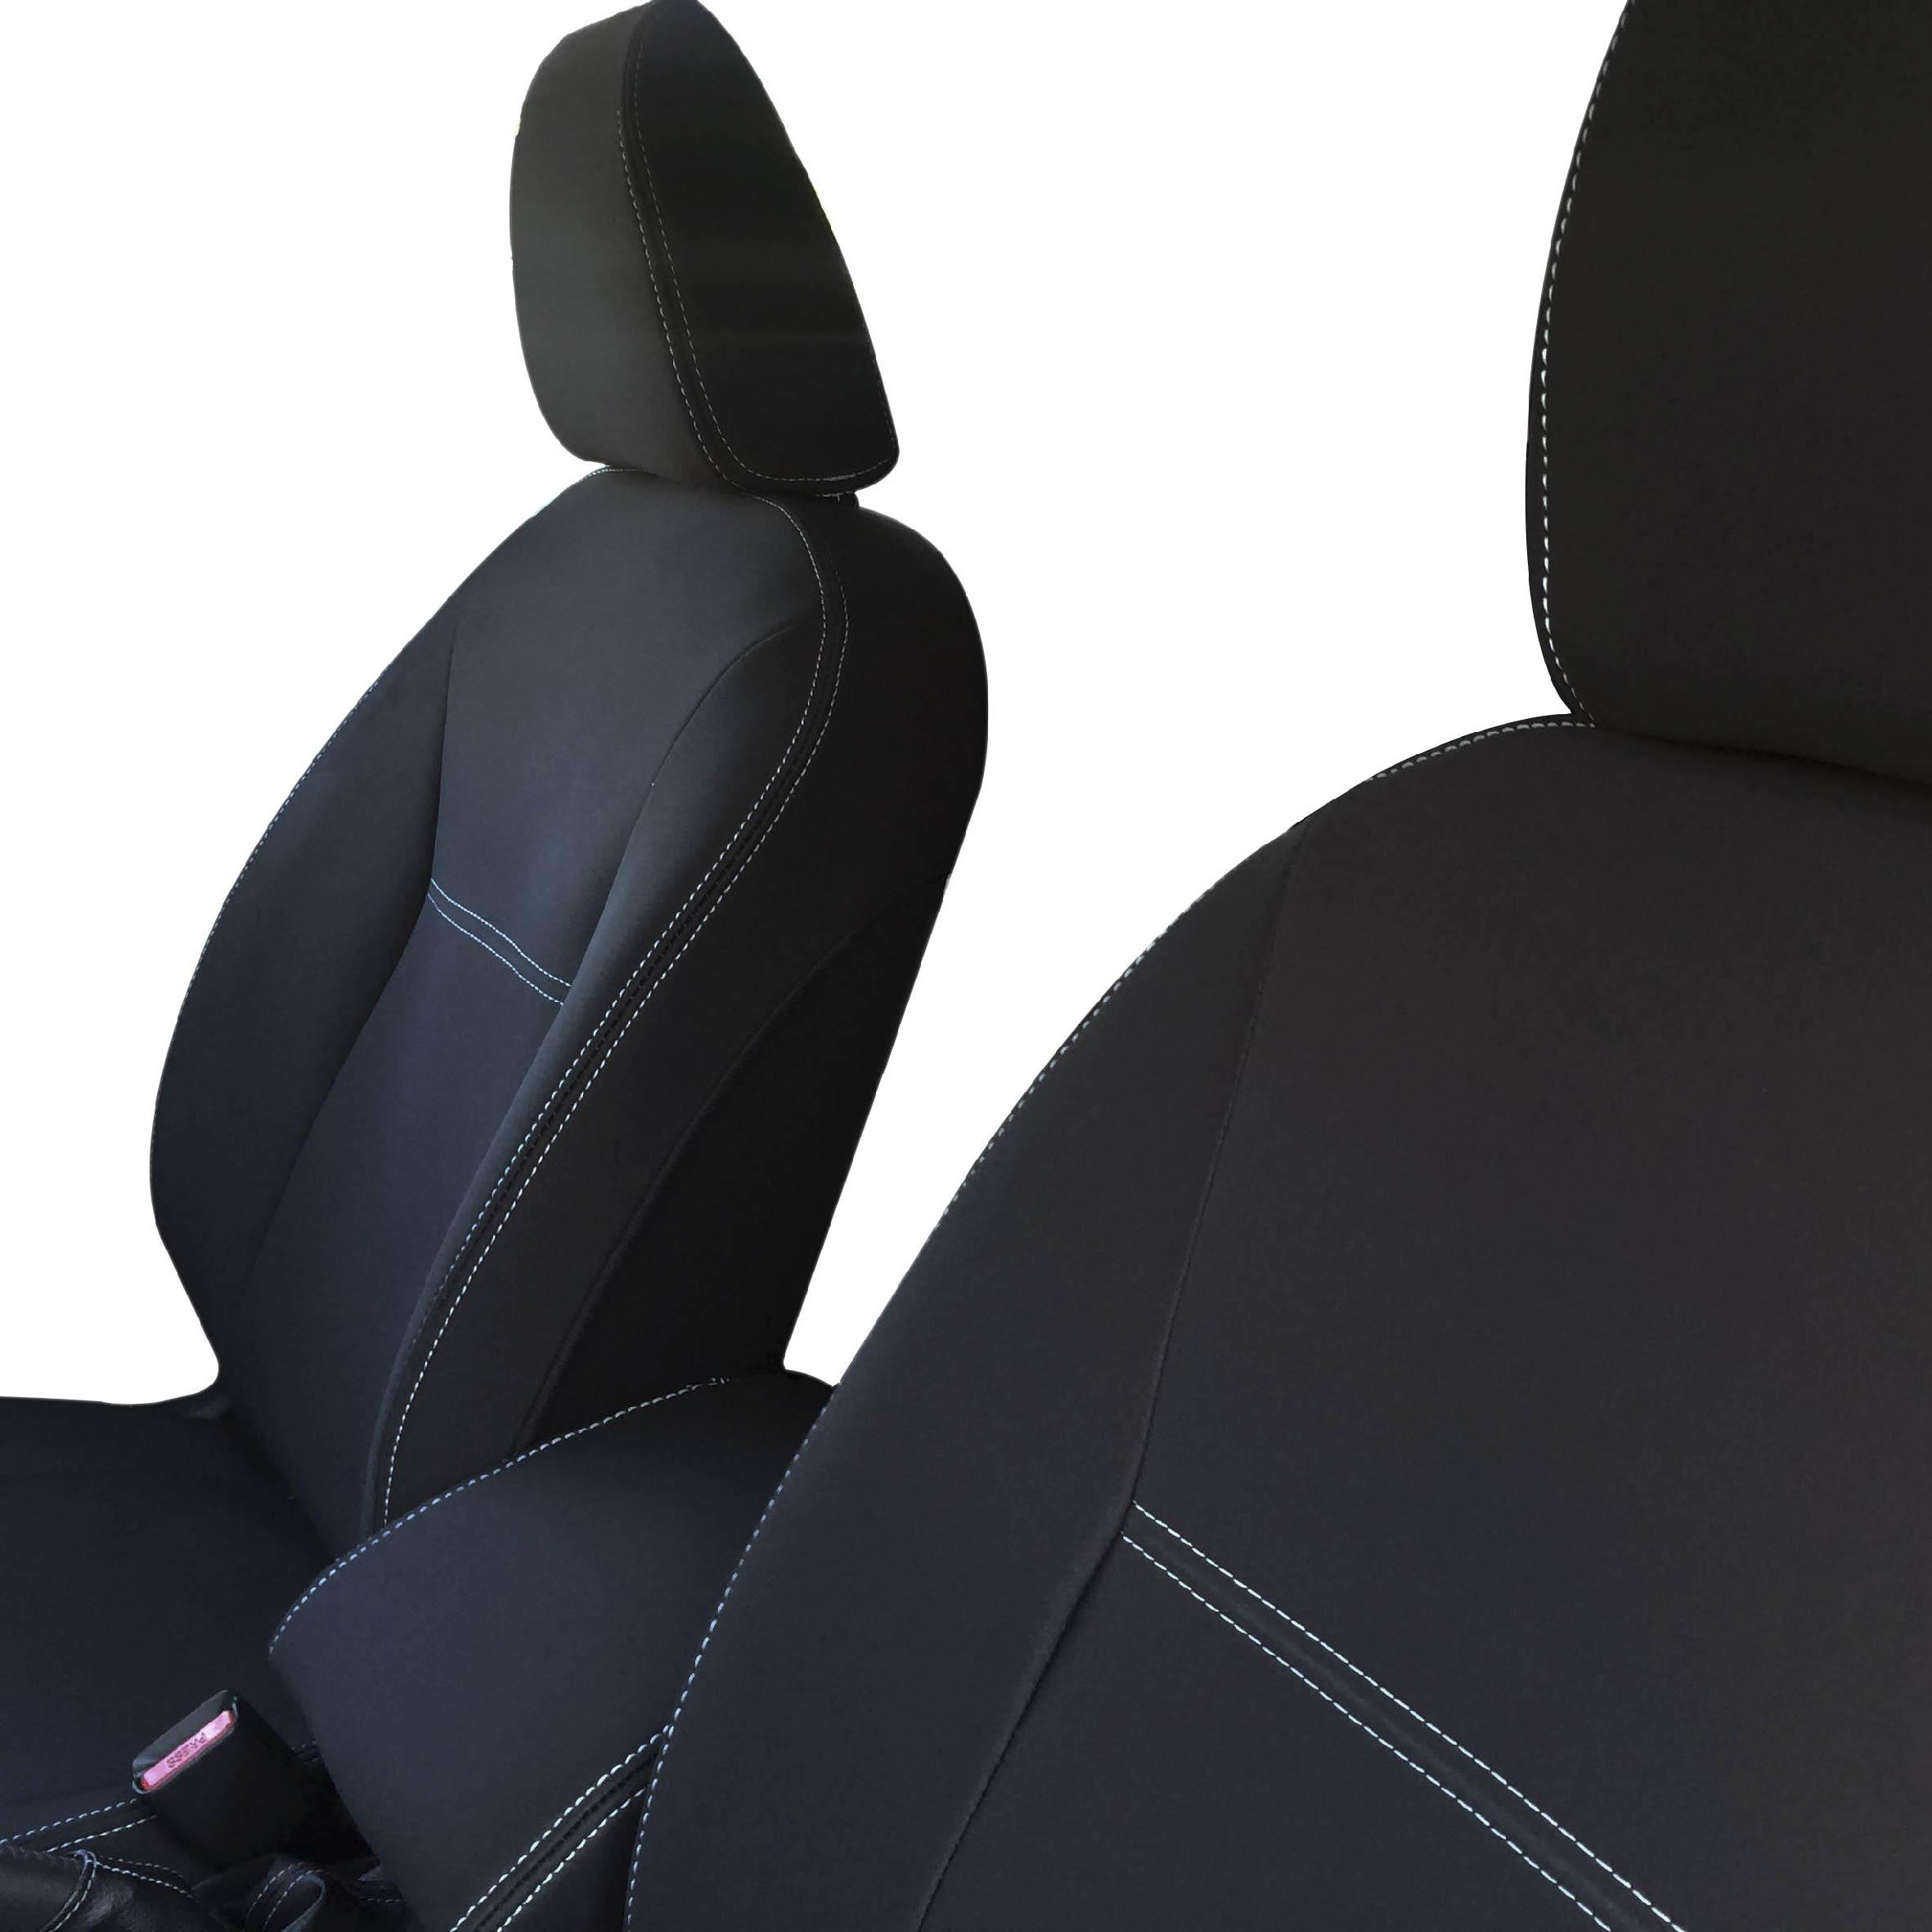 HOLDEN COLORADO FULL BACK FRONT PAIR PREMIUM WATERPROOF NEOPRENE CAR SEAT COVERS